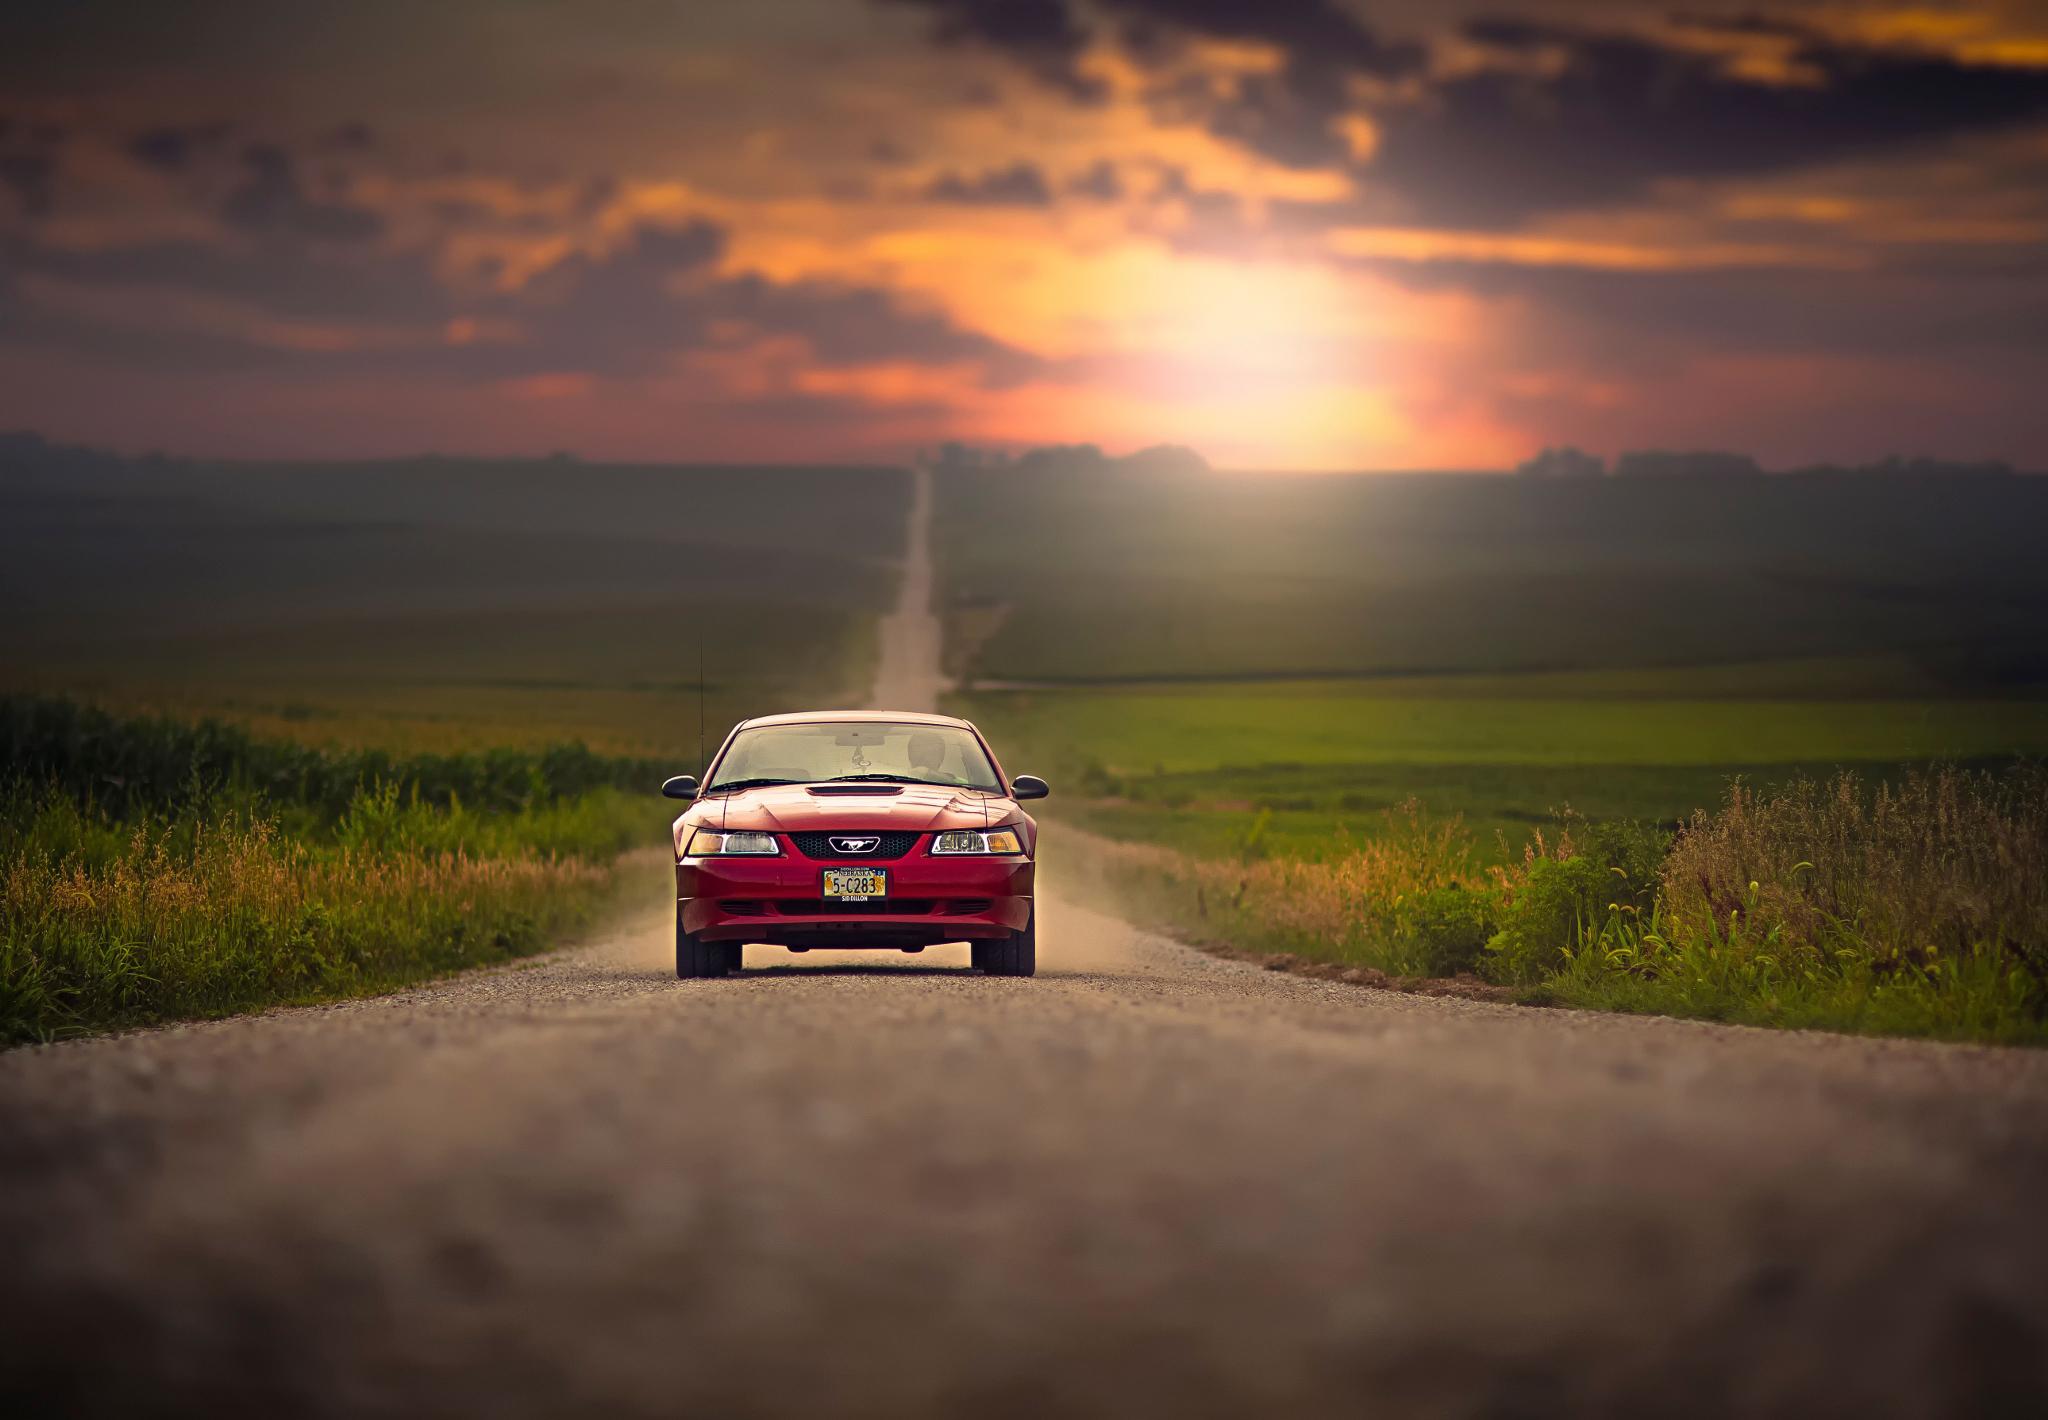 150711 descargar fondo de pantalla Coches, Ford Mustang, Vado, Automóvil, Tráfico, Movimiento, Camino: protectores de pantalla e imágenes gratis